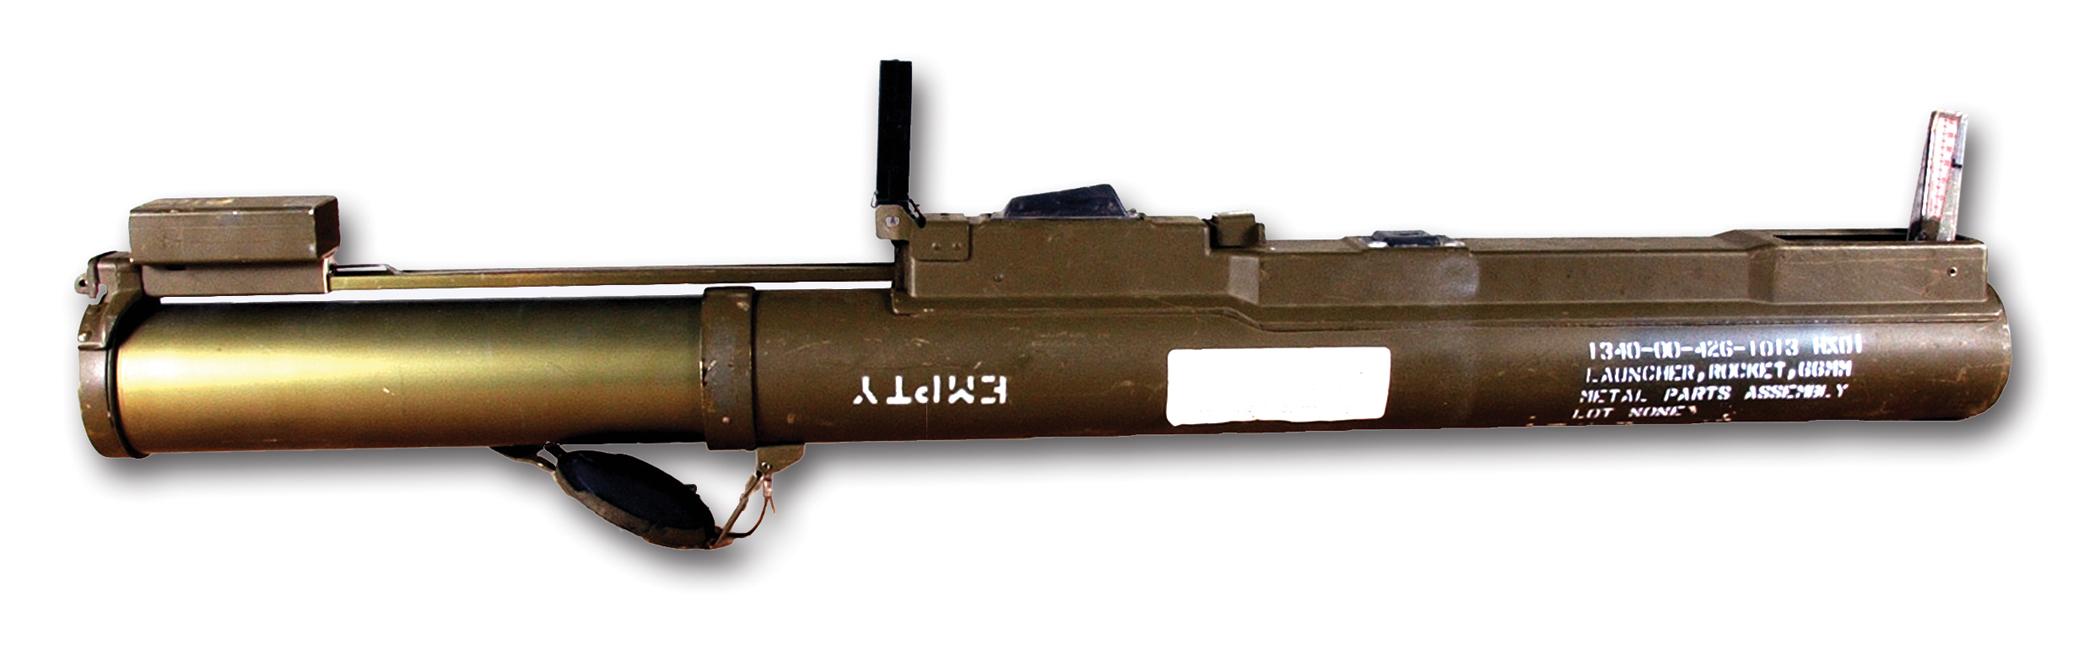 https://www.inetres.com/gp/military/infantry/antiarmor/M72/M72.jpg